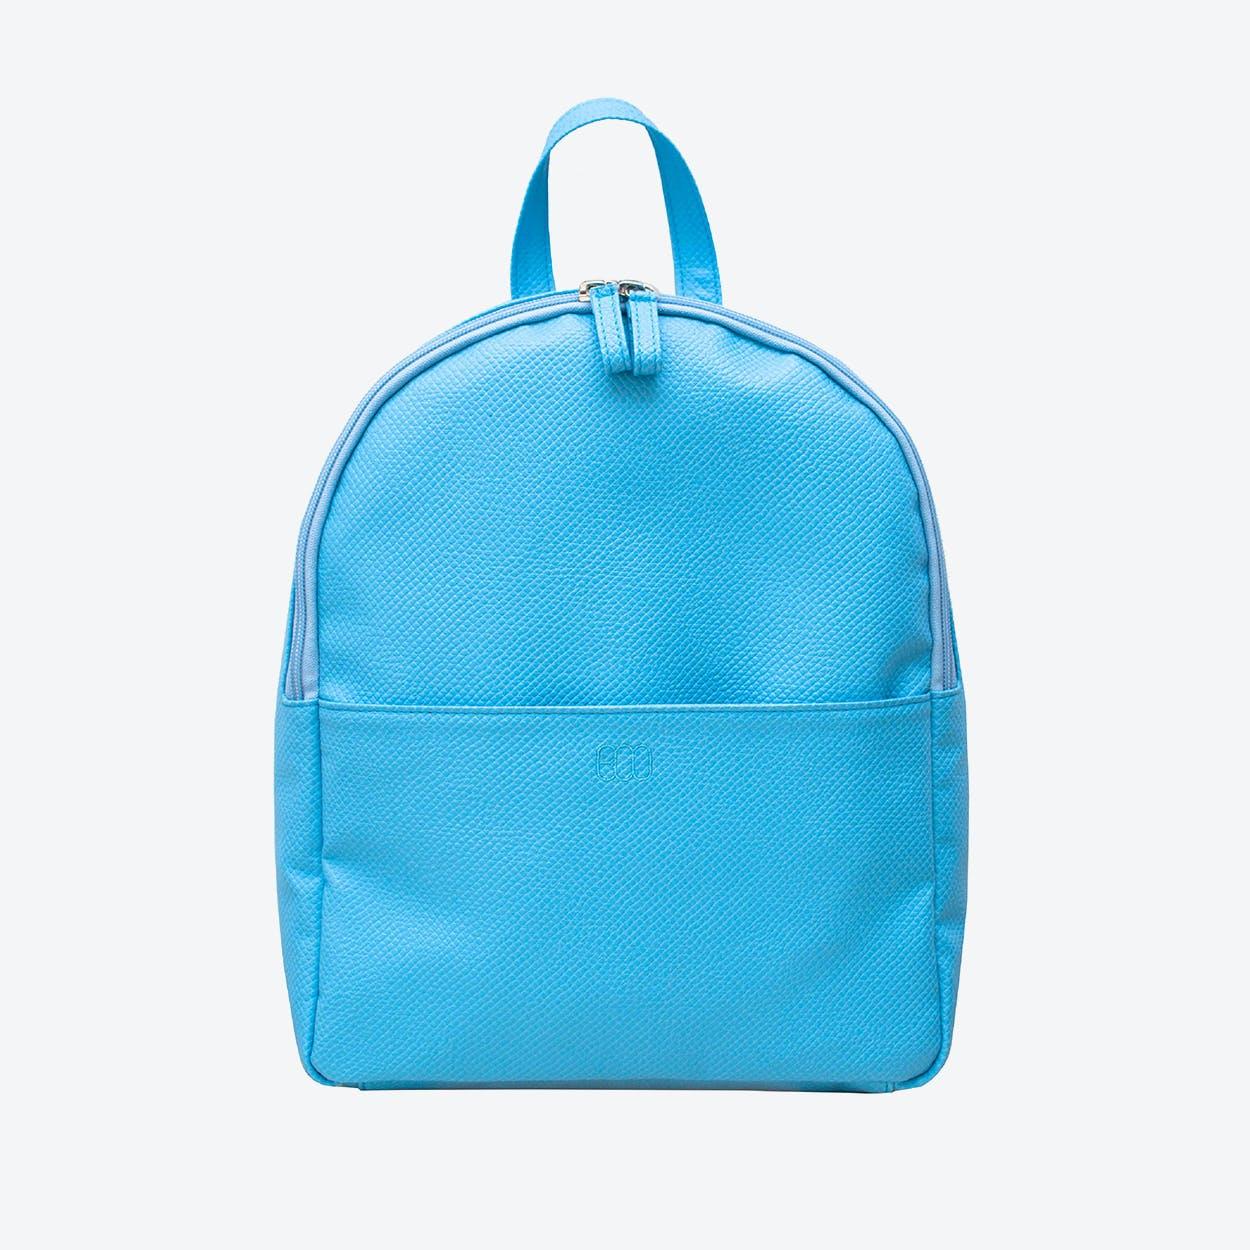 Wave Backpack in Blue